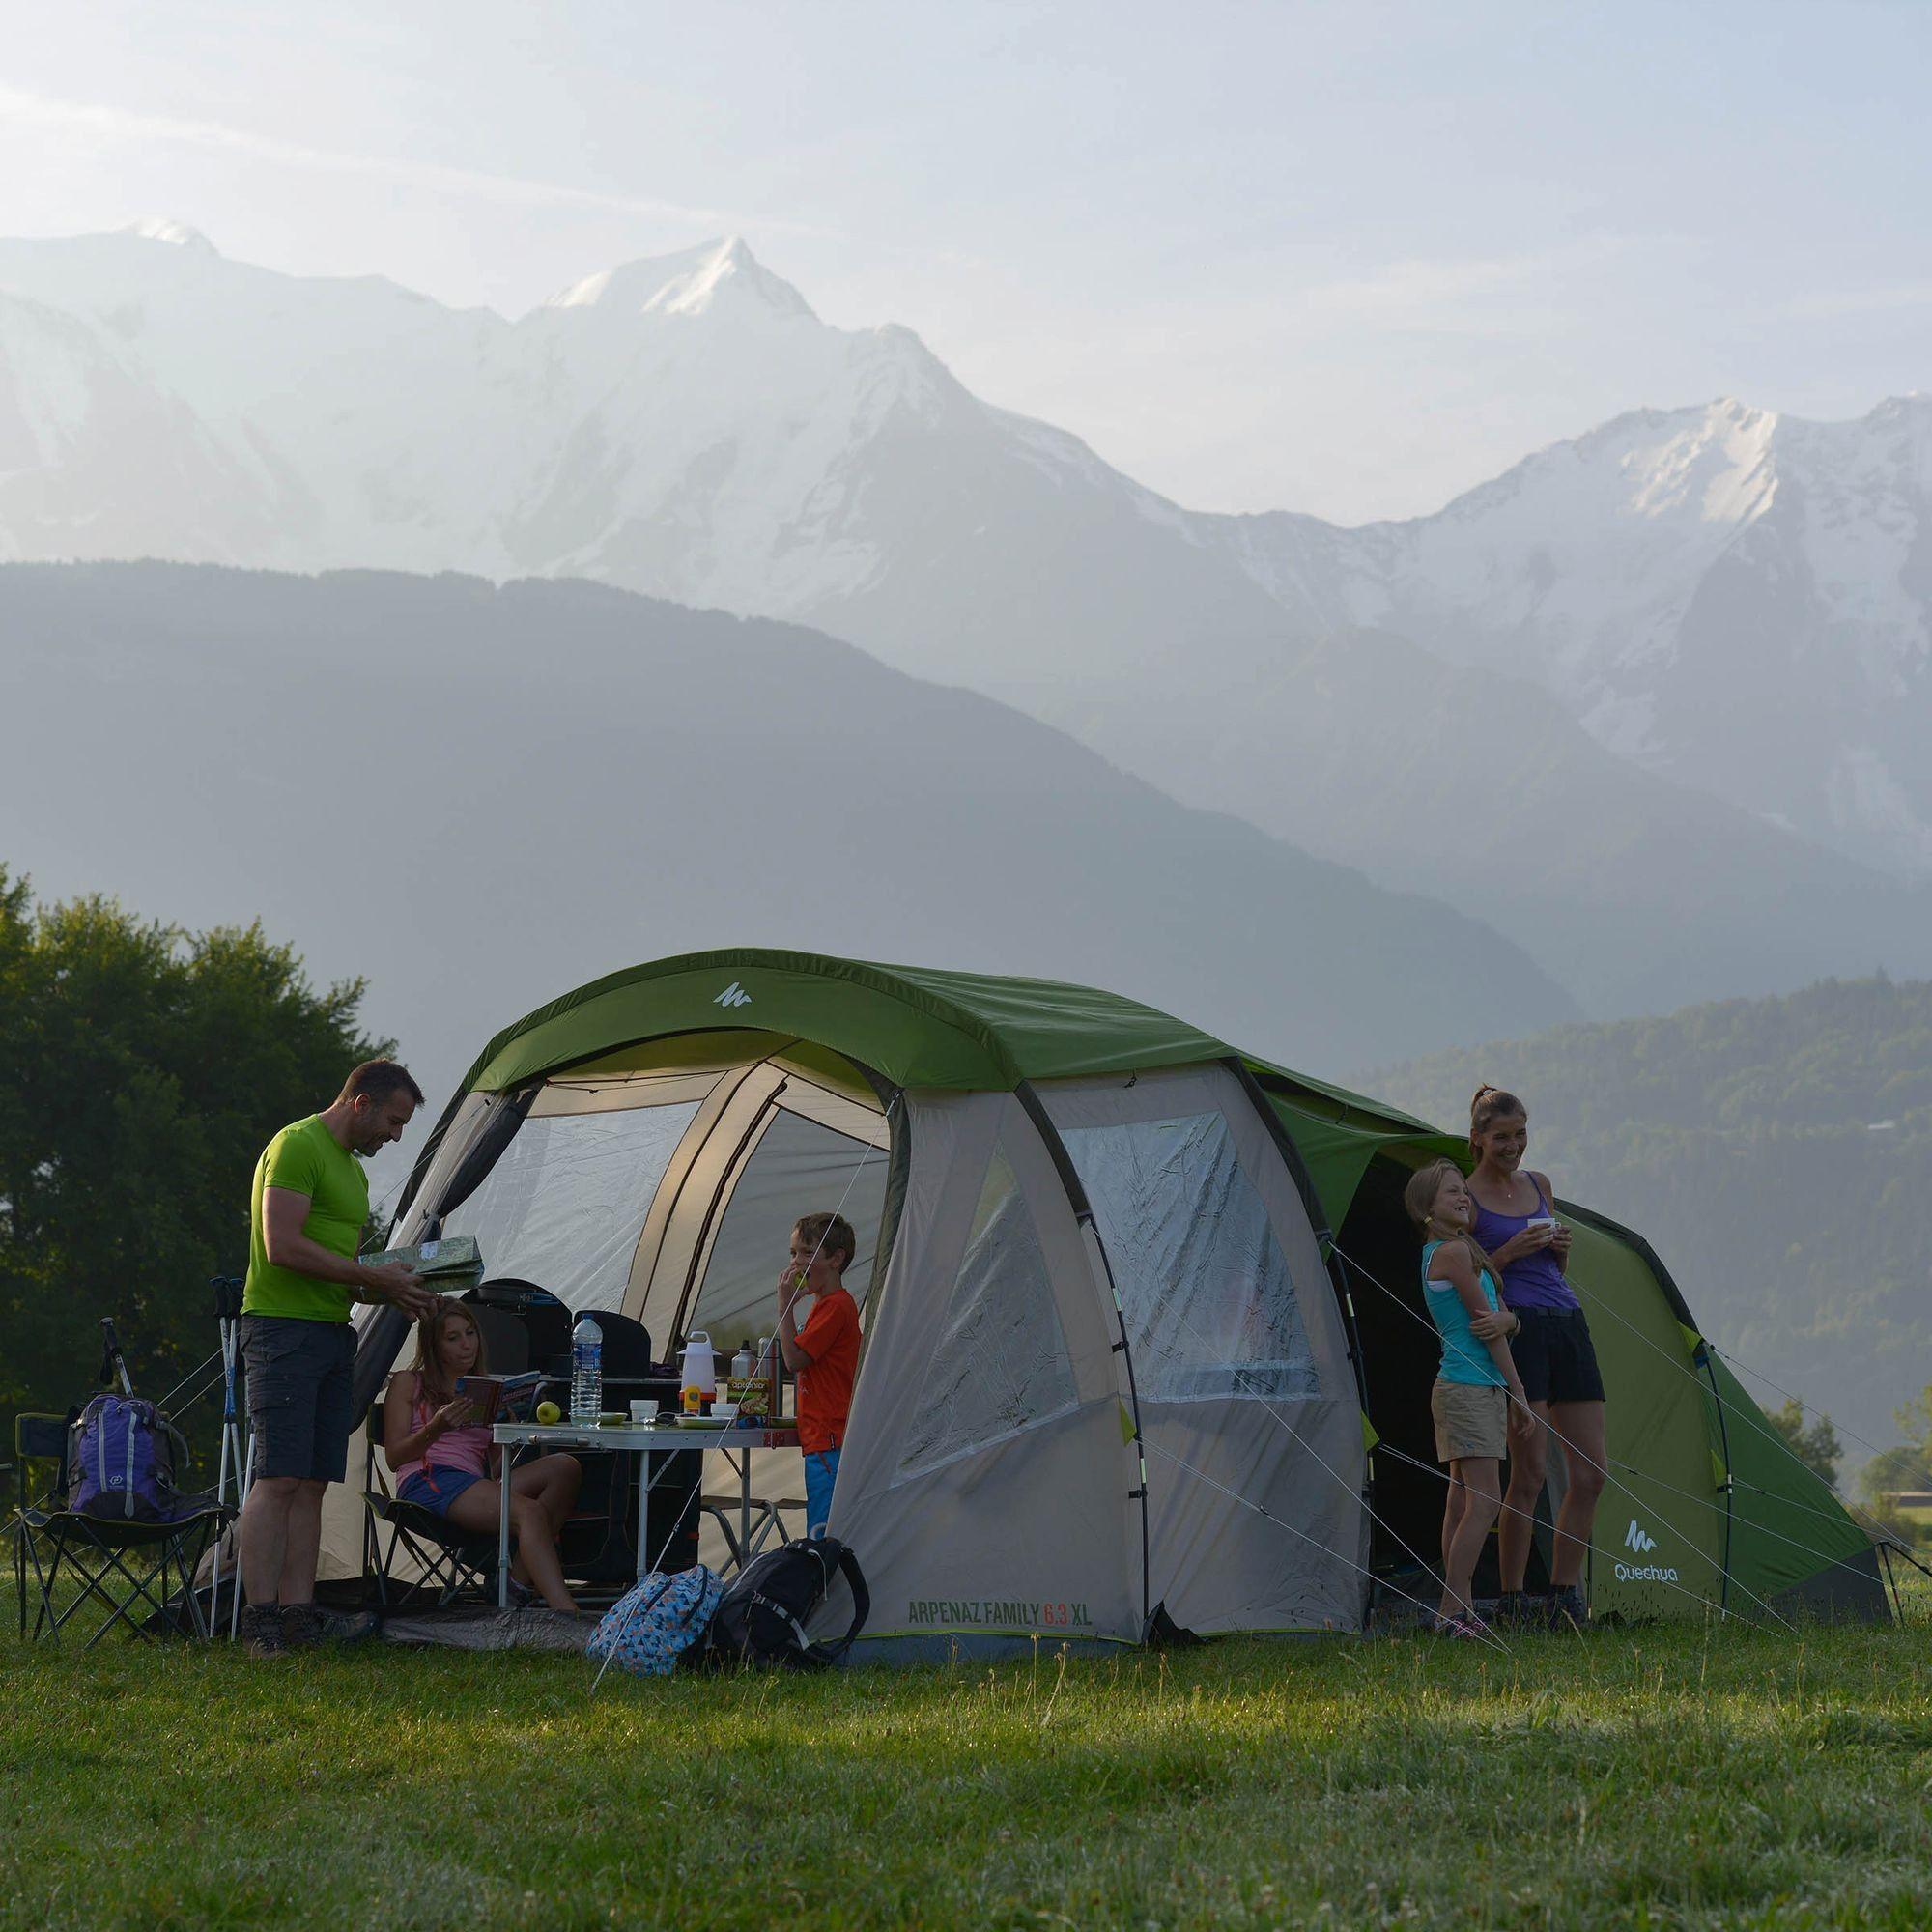 tente familiale t 6 3 xl quechua camping tente. Black Bedroom Furniture Sets. Home Design Ideas